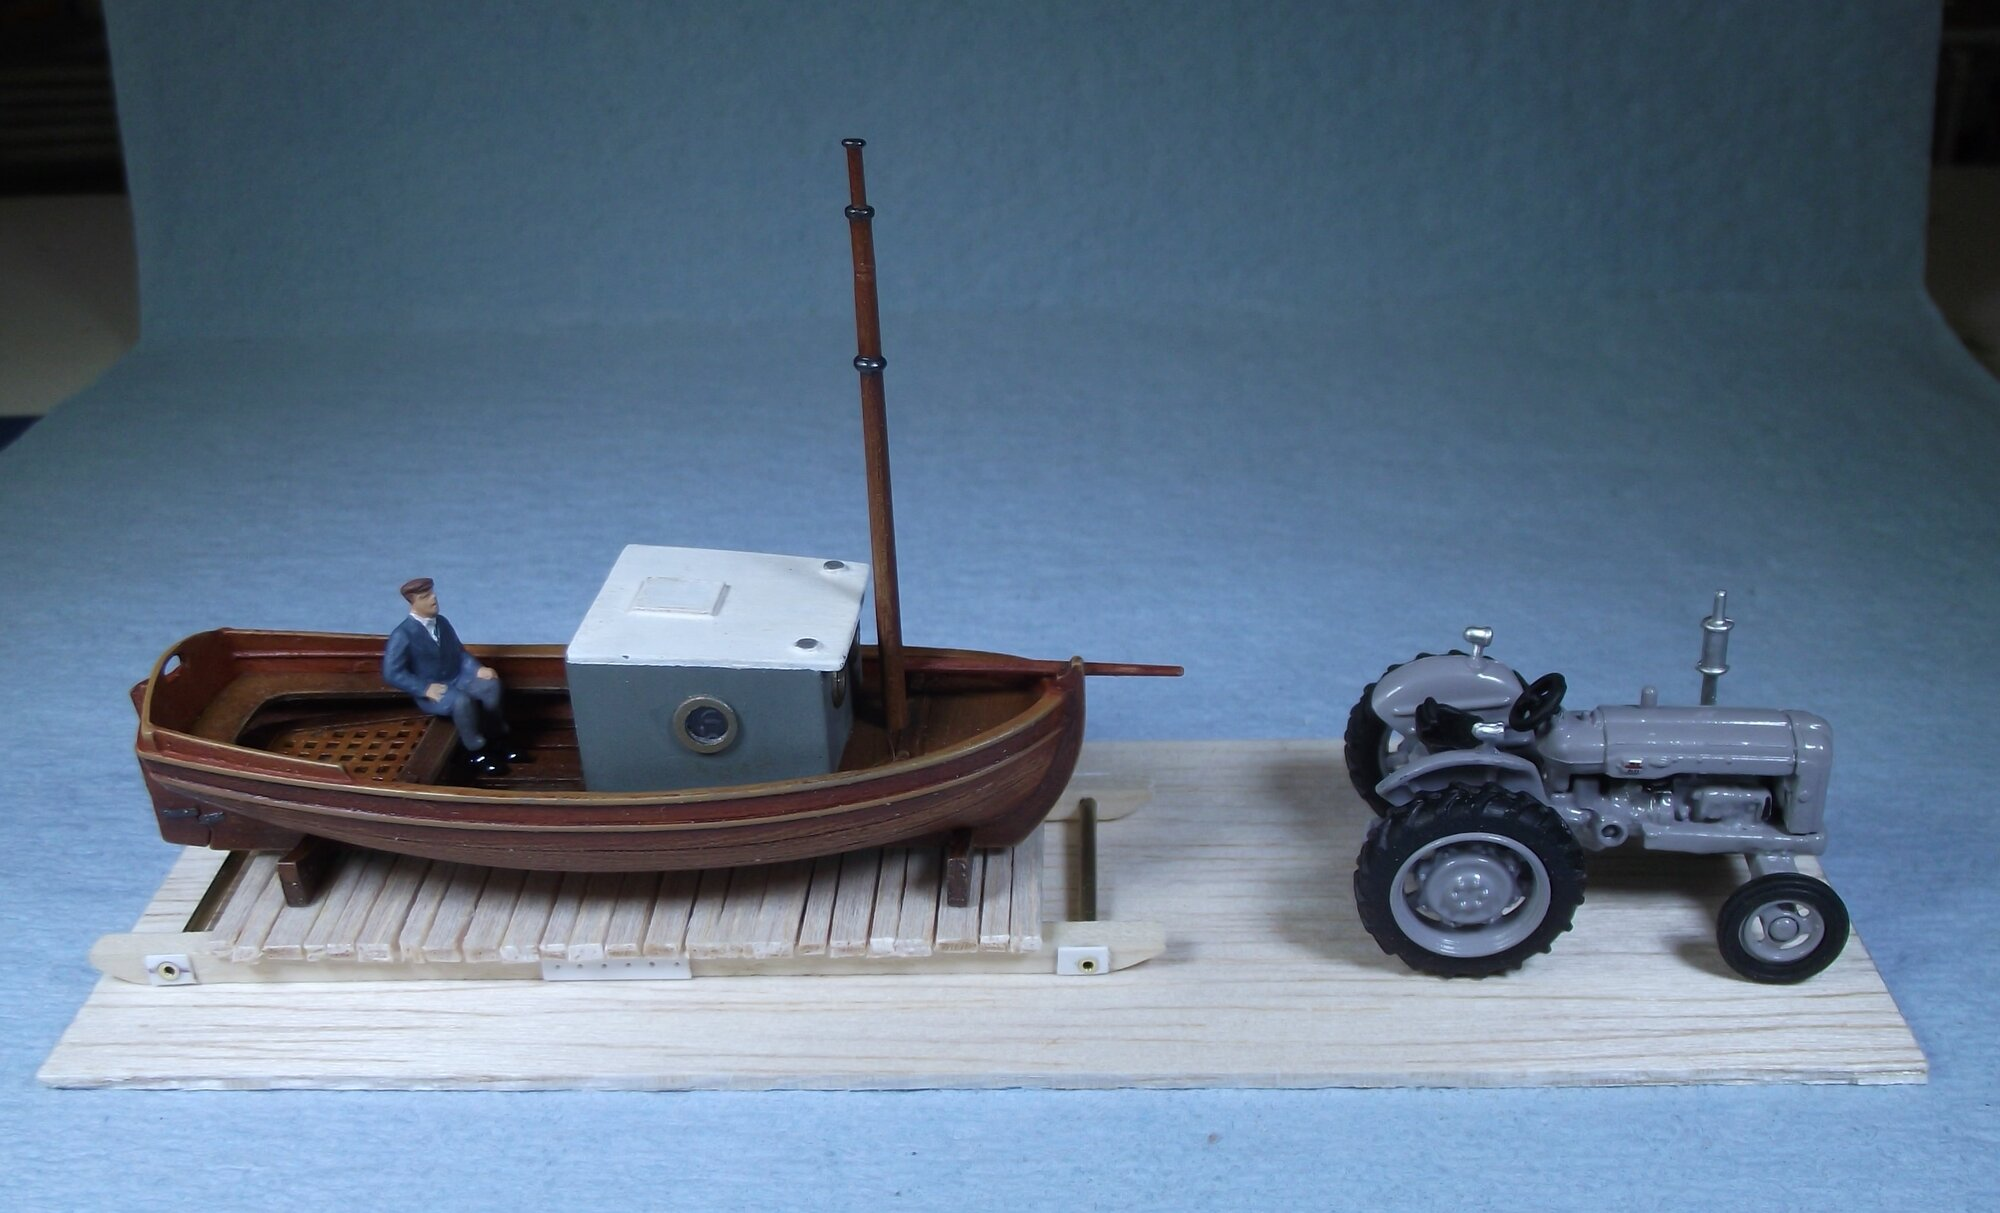 Boat_05-09-2021 (5).jpg